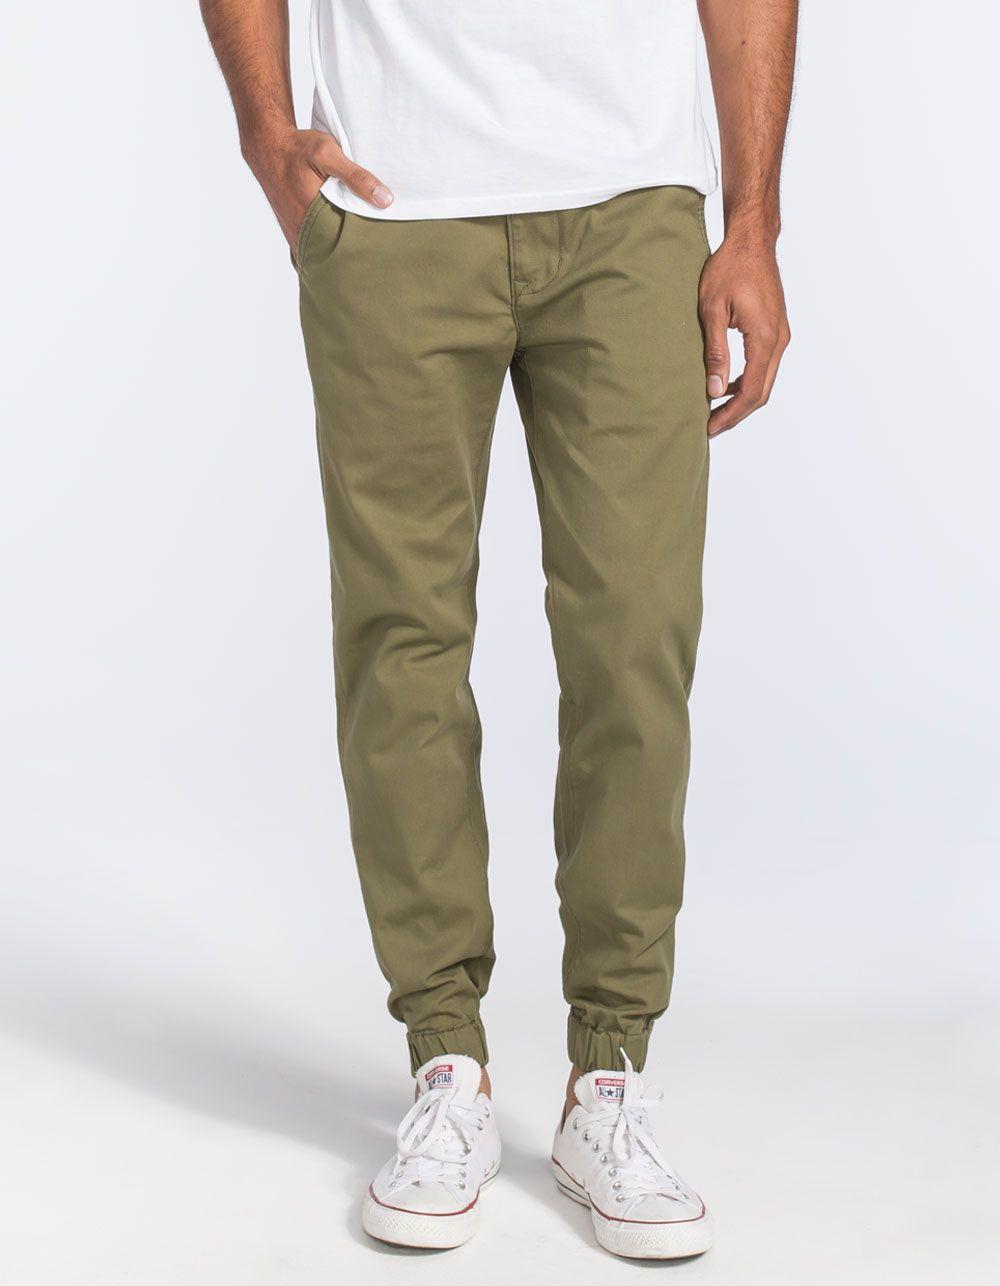 a8ce136c LEVI'S Mens Chino Jogger Pants 254164531   Joggers & Sweatpants ...